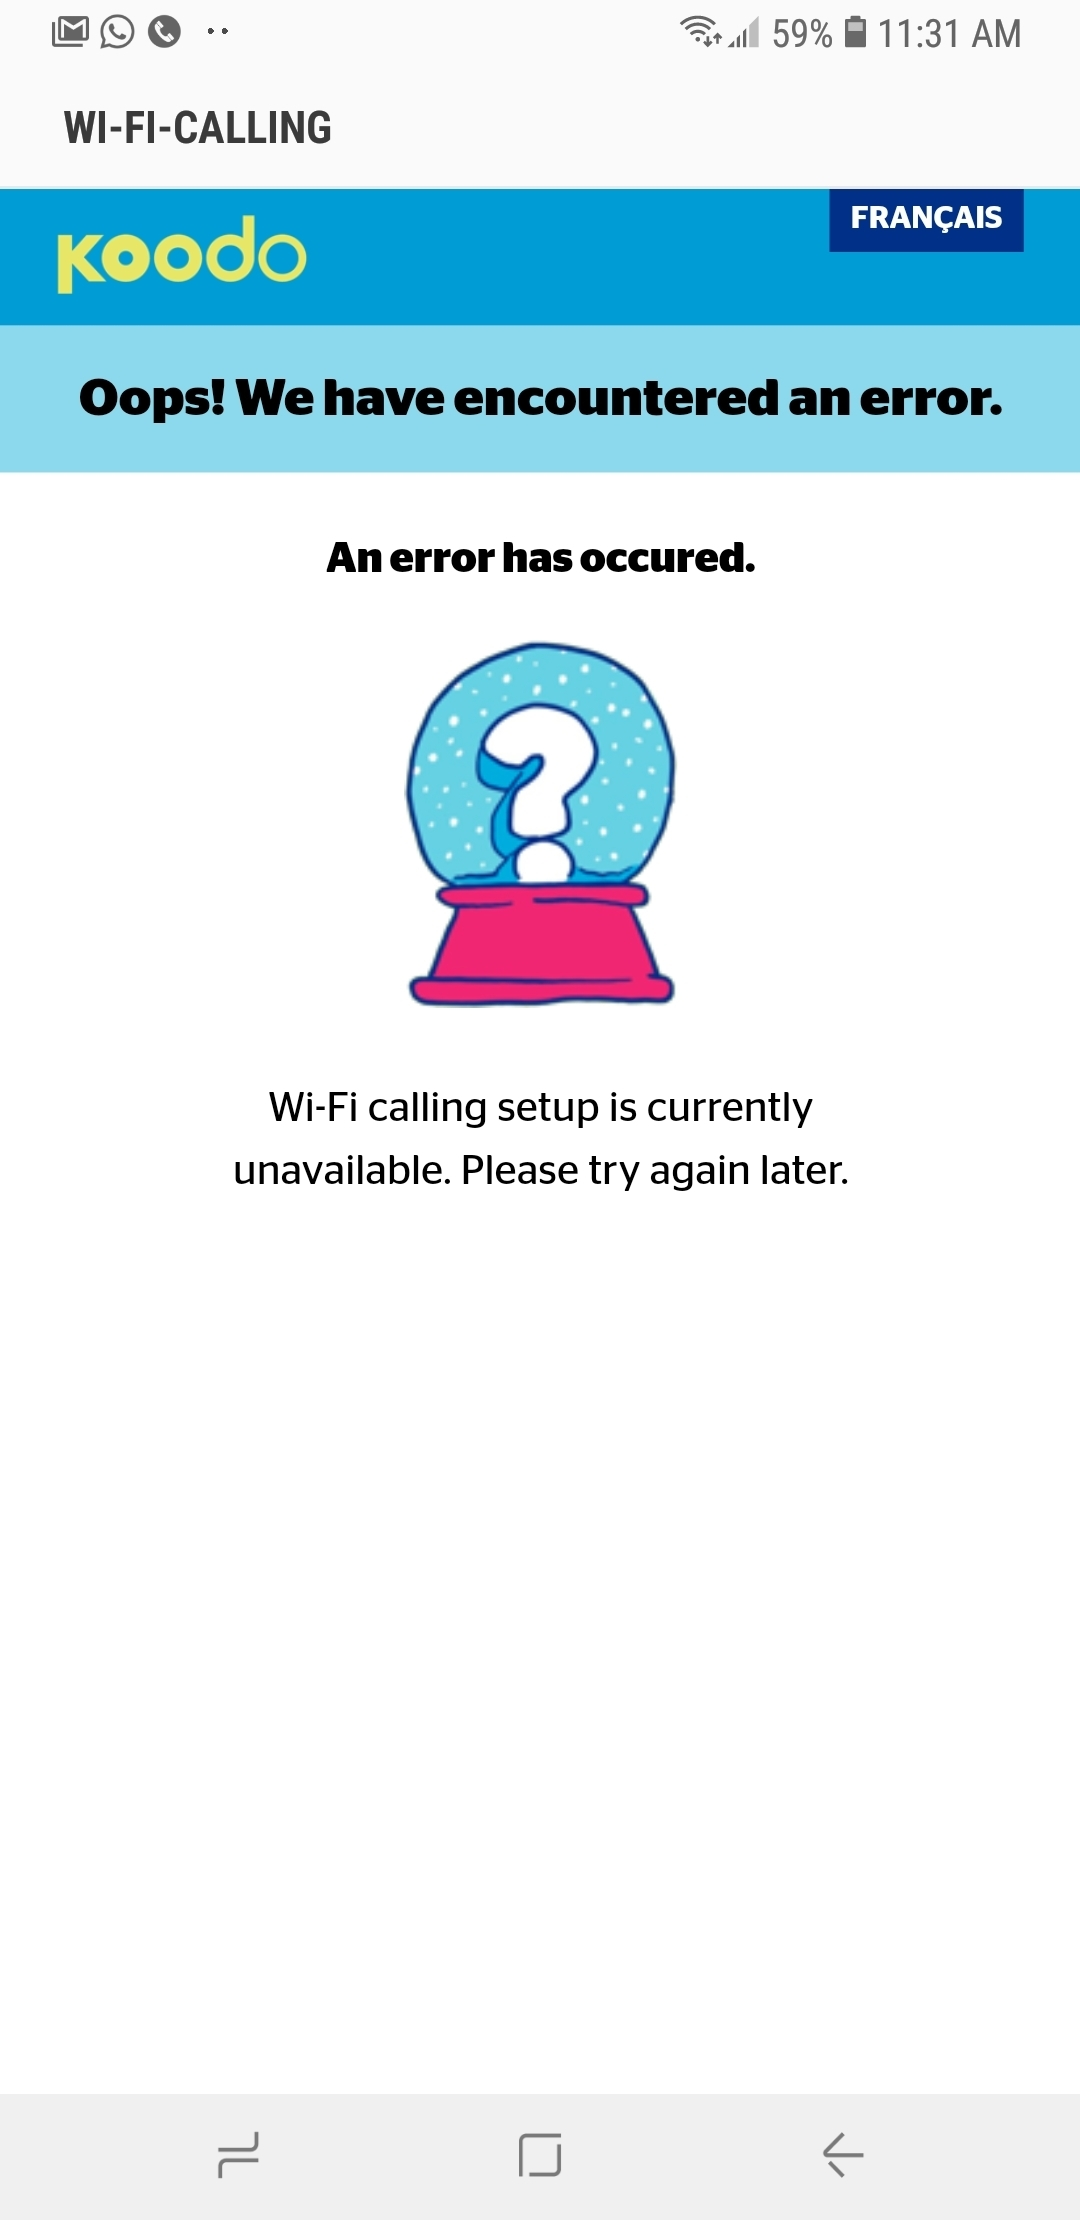 WiFi Calling Setup Error Page | Koodo Community